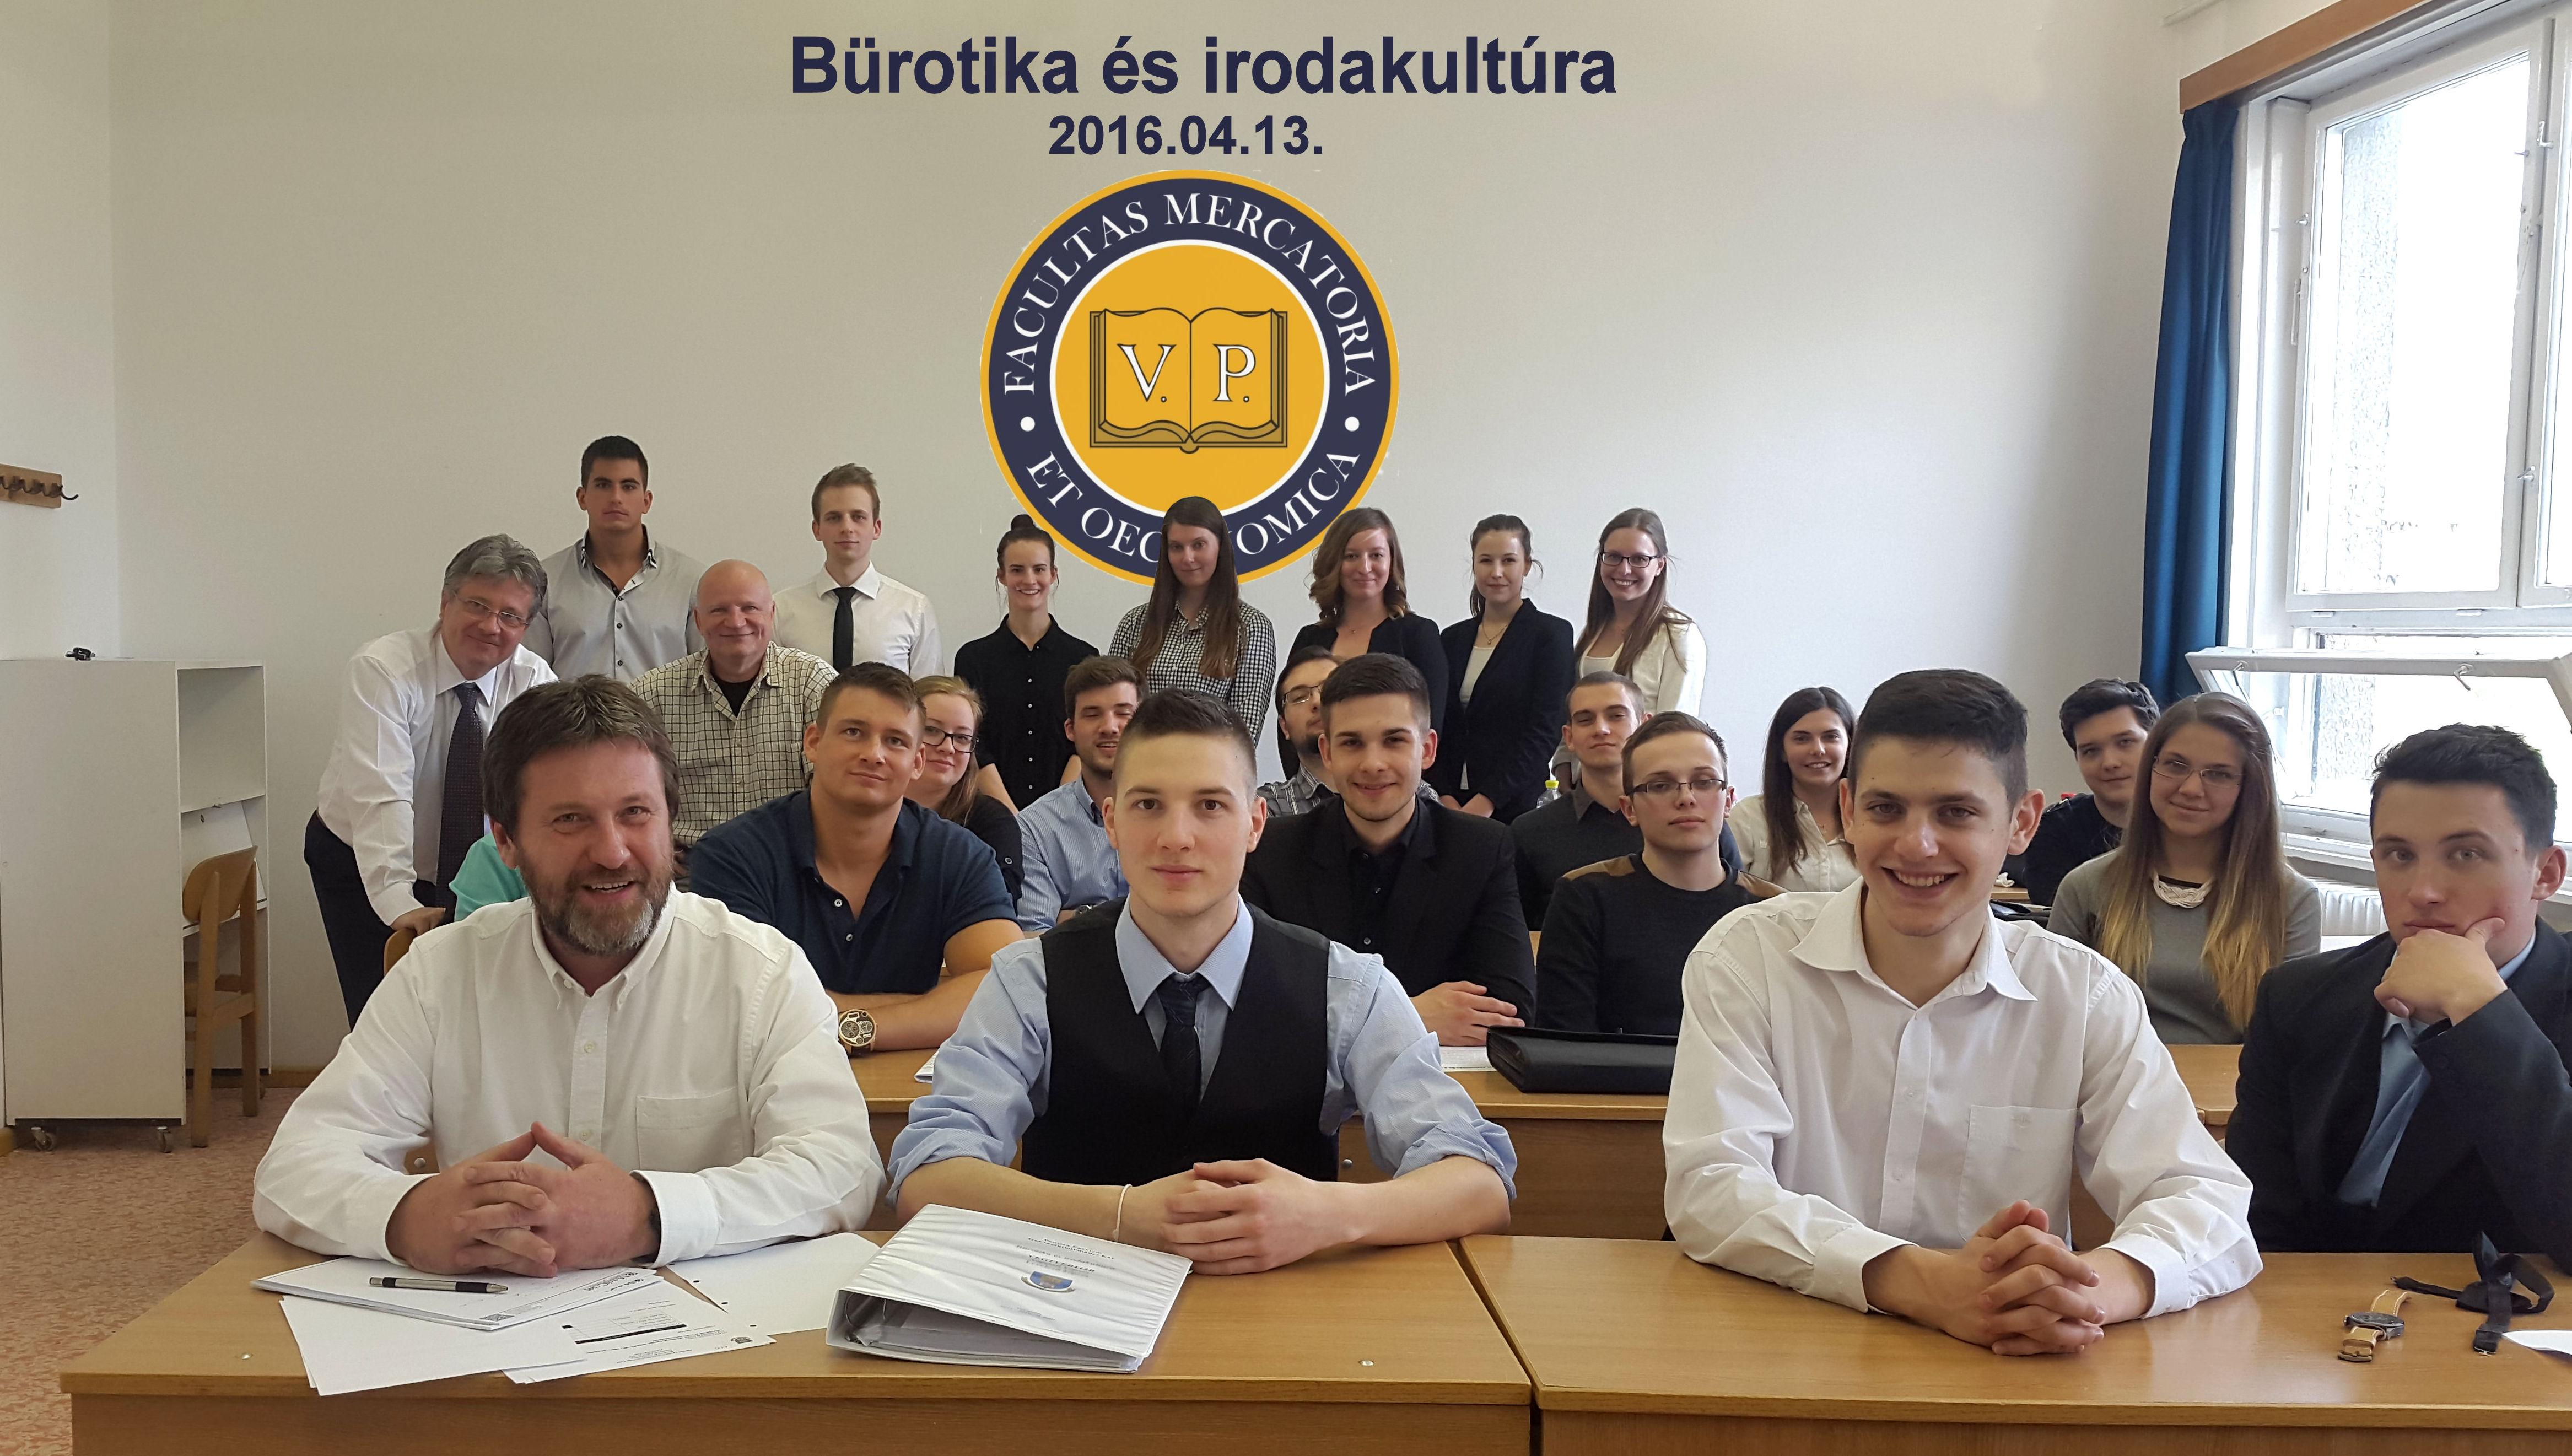 2016_04_13_burotika_irodakultura.jpg